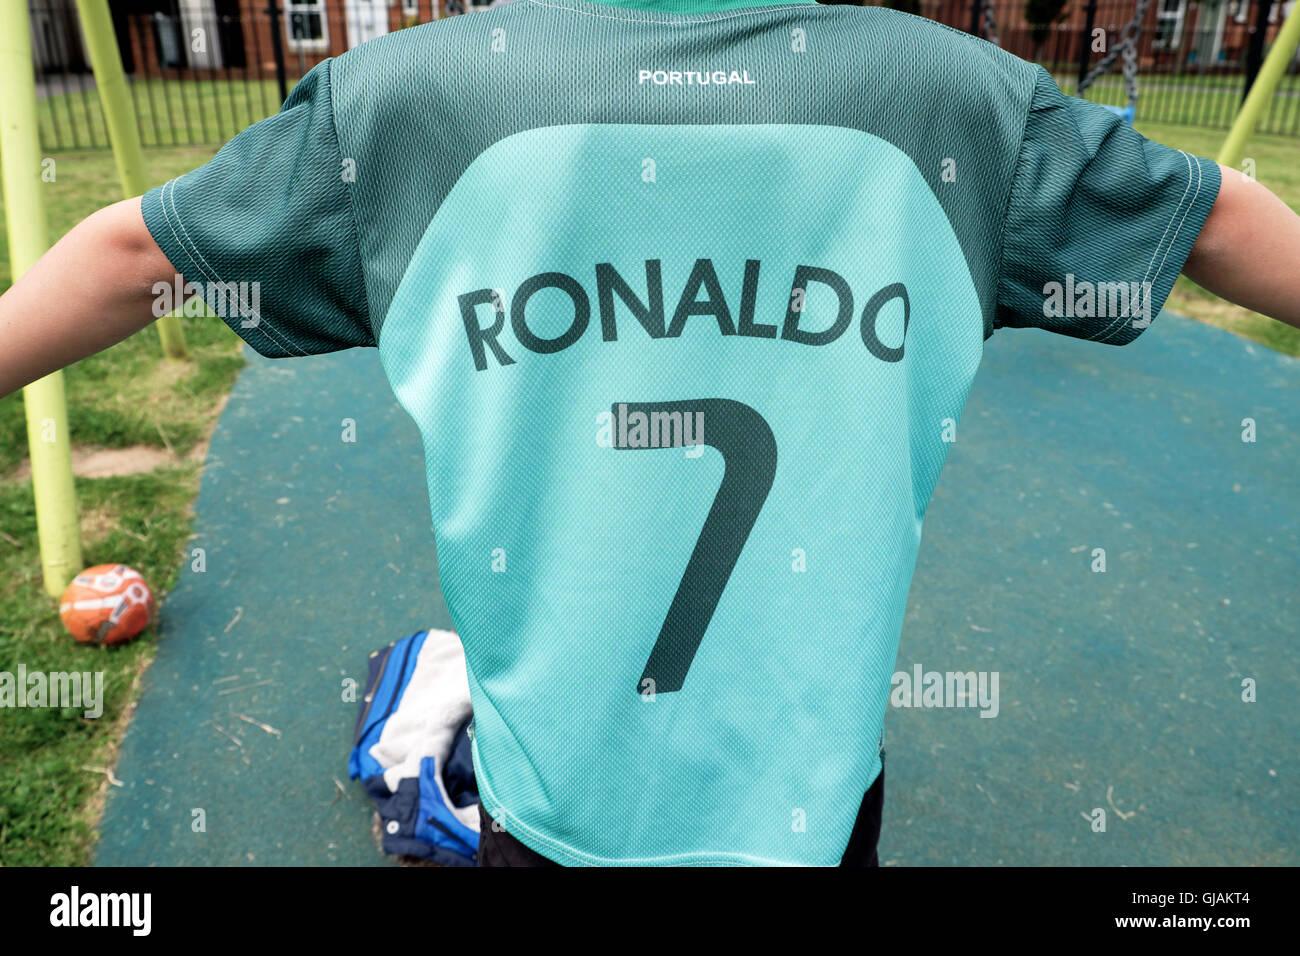 c628d93f0 Child fan wearing Cristiano Ronaldo 7 green Portugal Euro 2016 football  shirt in UK playground KATHY